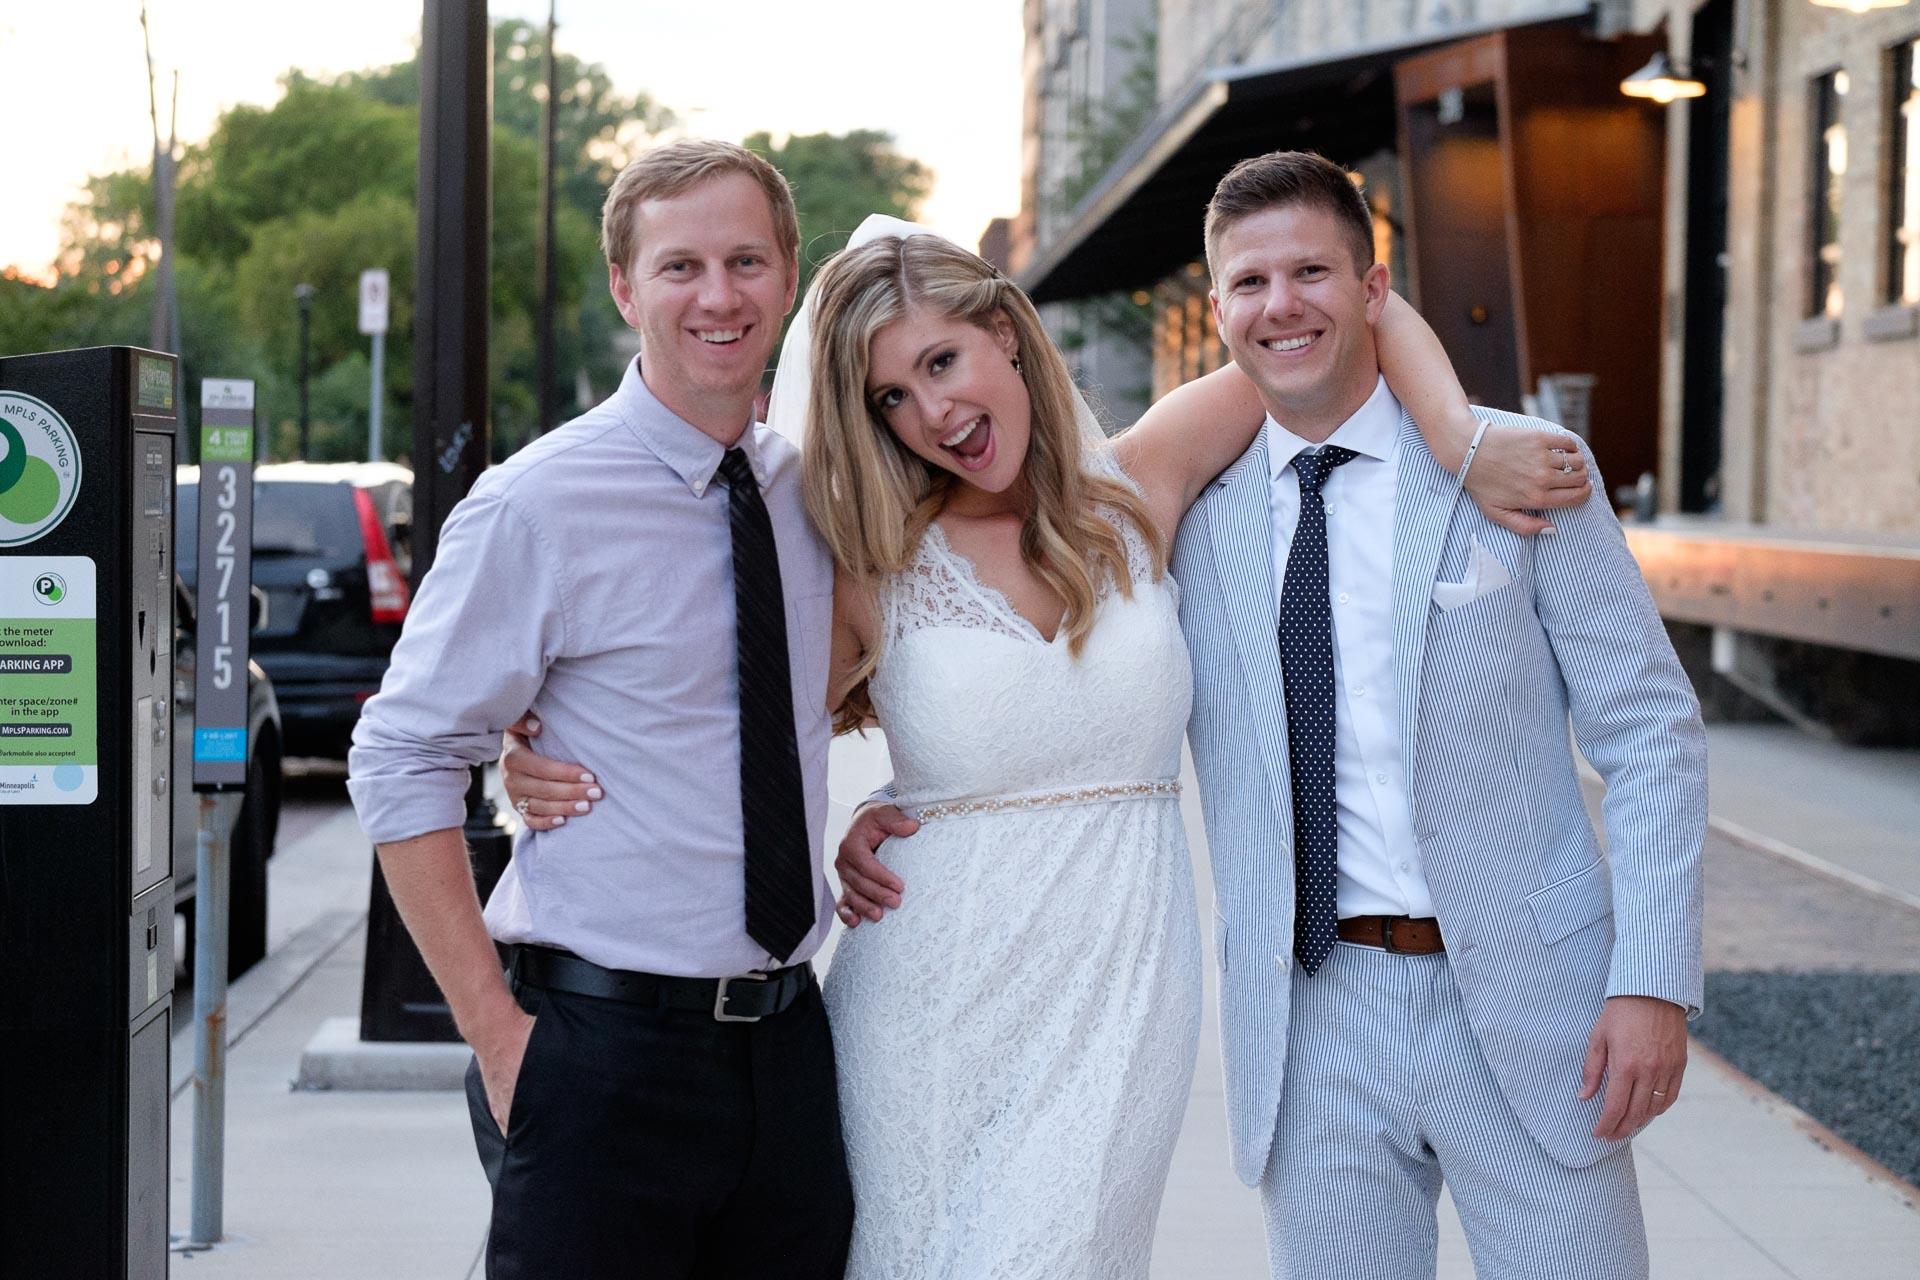 minneapolis-wedding-photographer-a-mill-artist-lofts0017